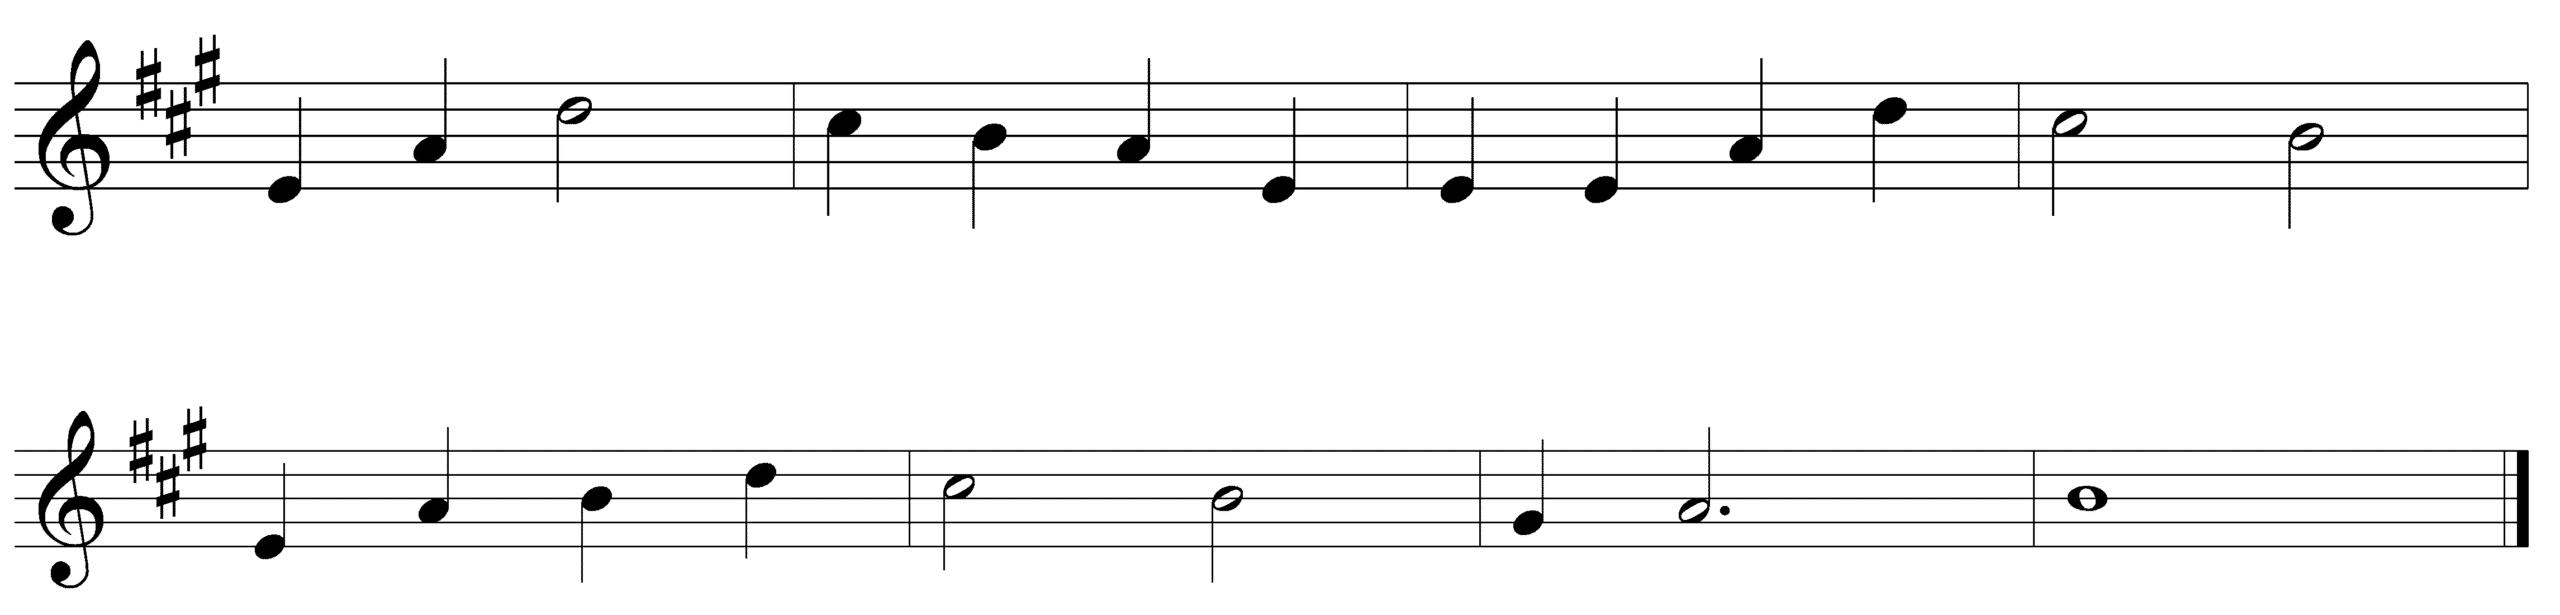 music notation quiz proprofs quiz